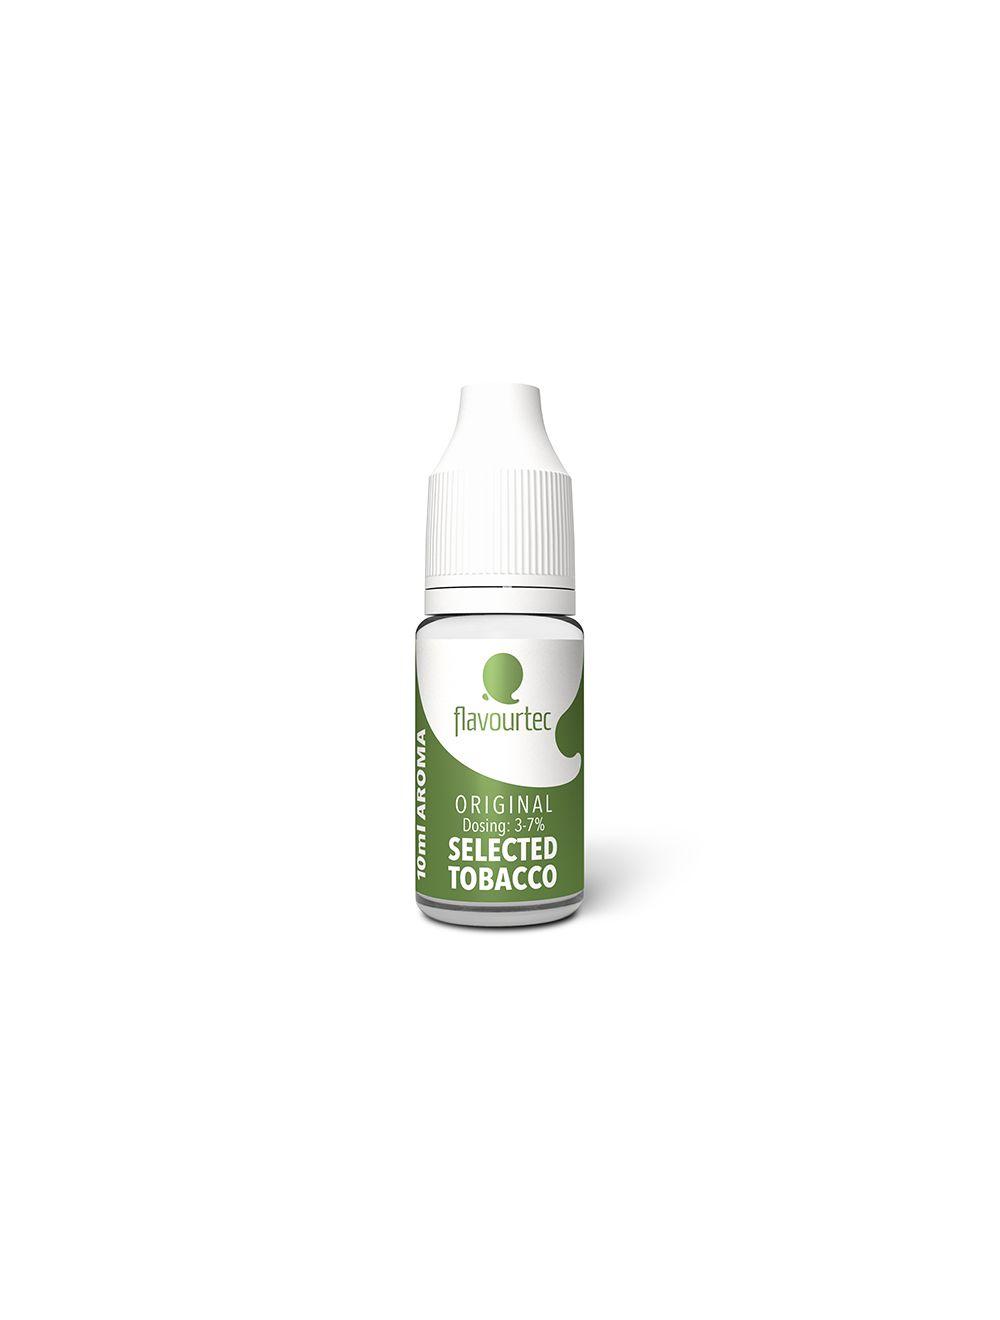 Aroma Flavourtec Original Selected Tobacco 10ml